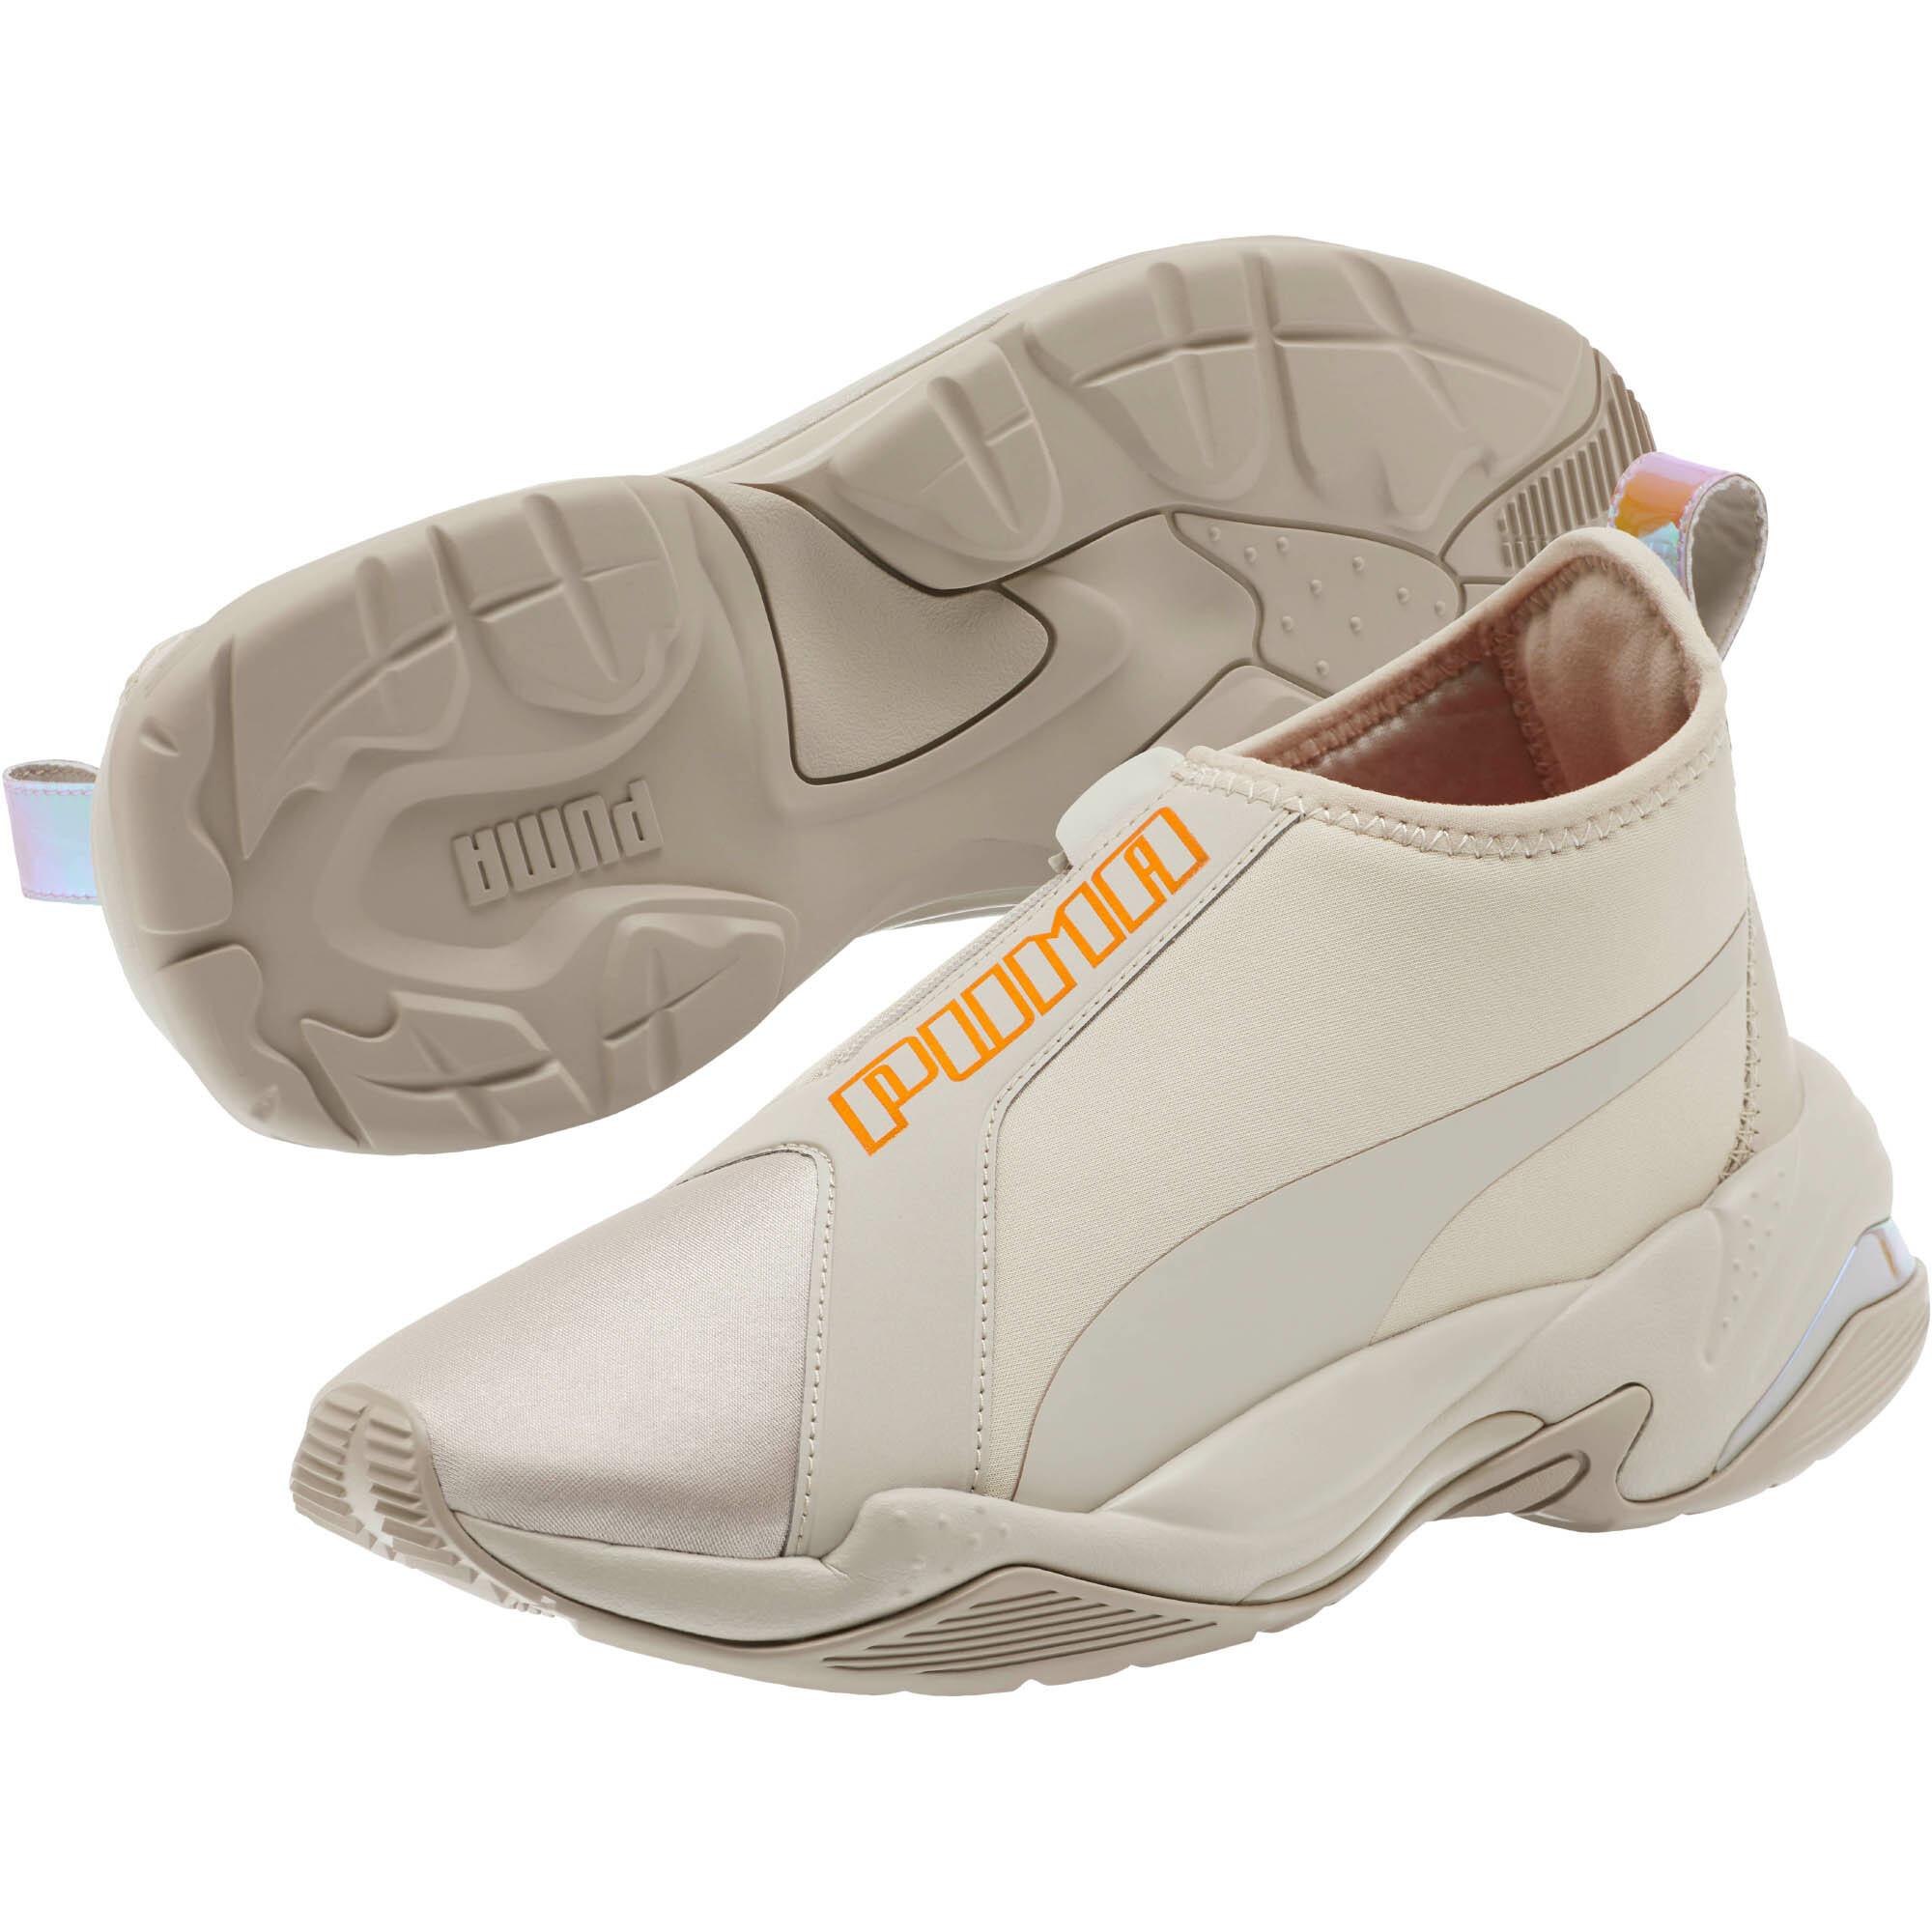 Image Puma Thunder Metallic Trailblazer Women's Sneakers #2